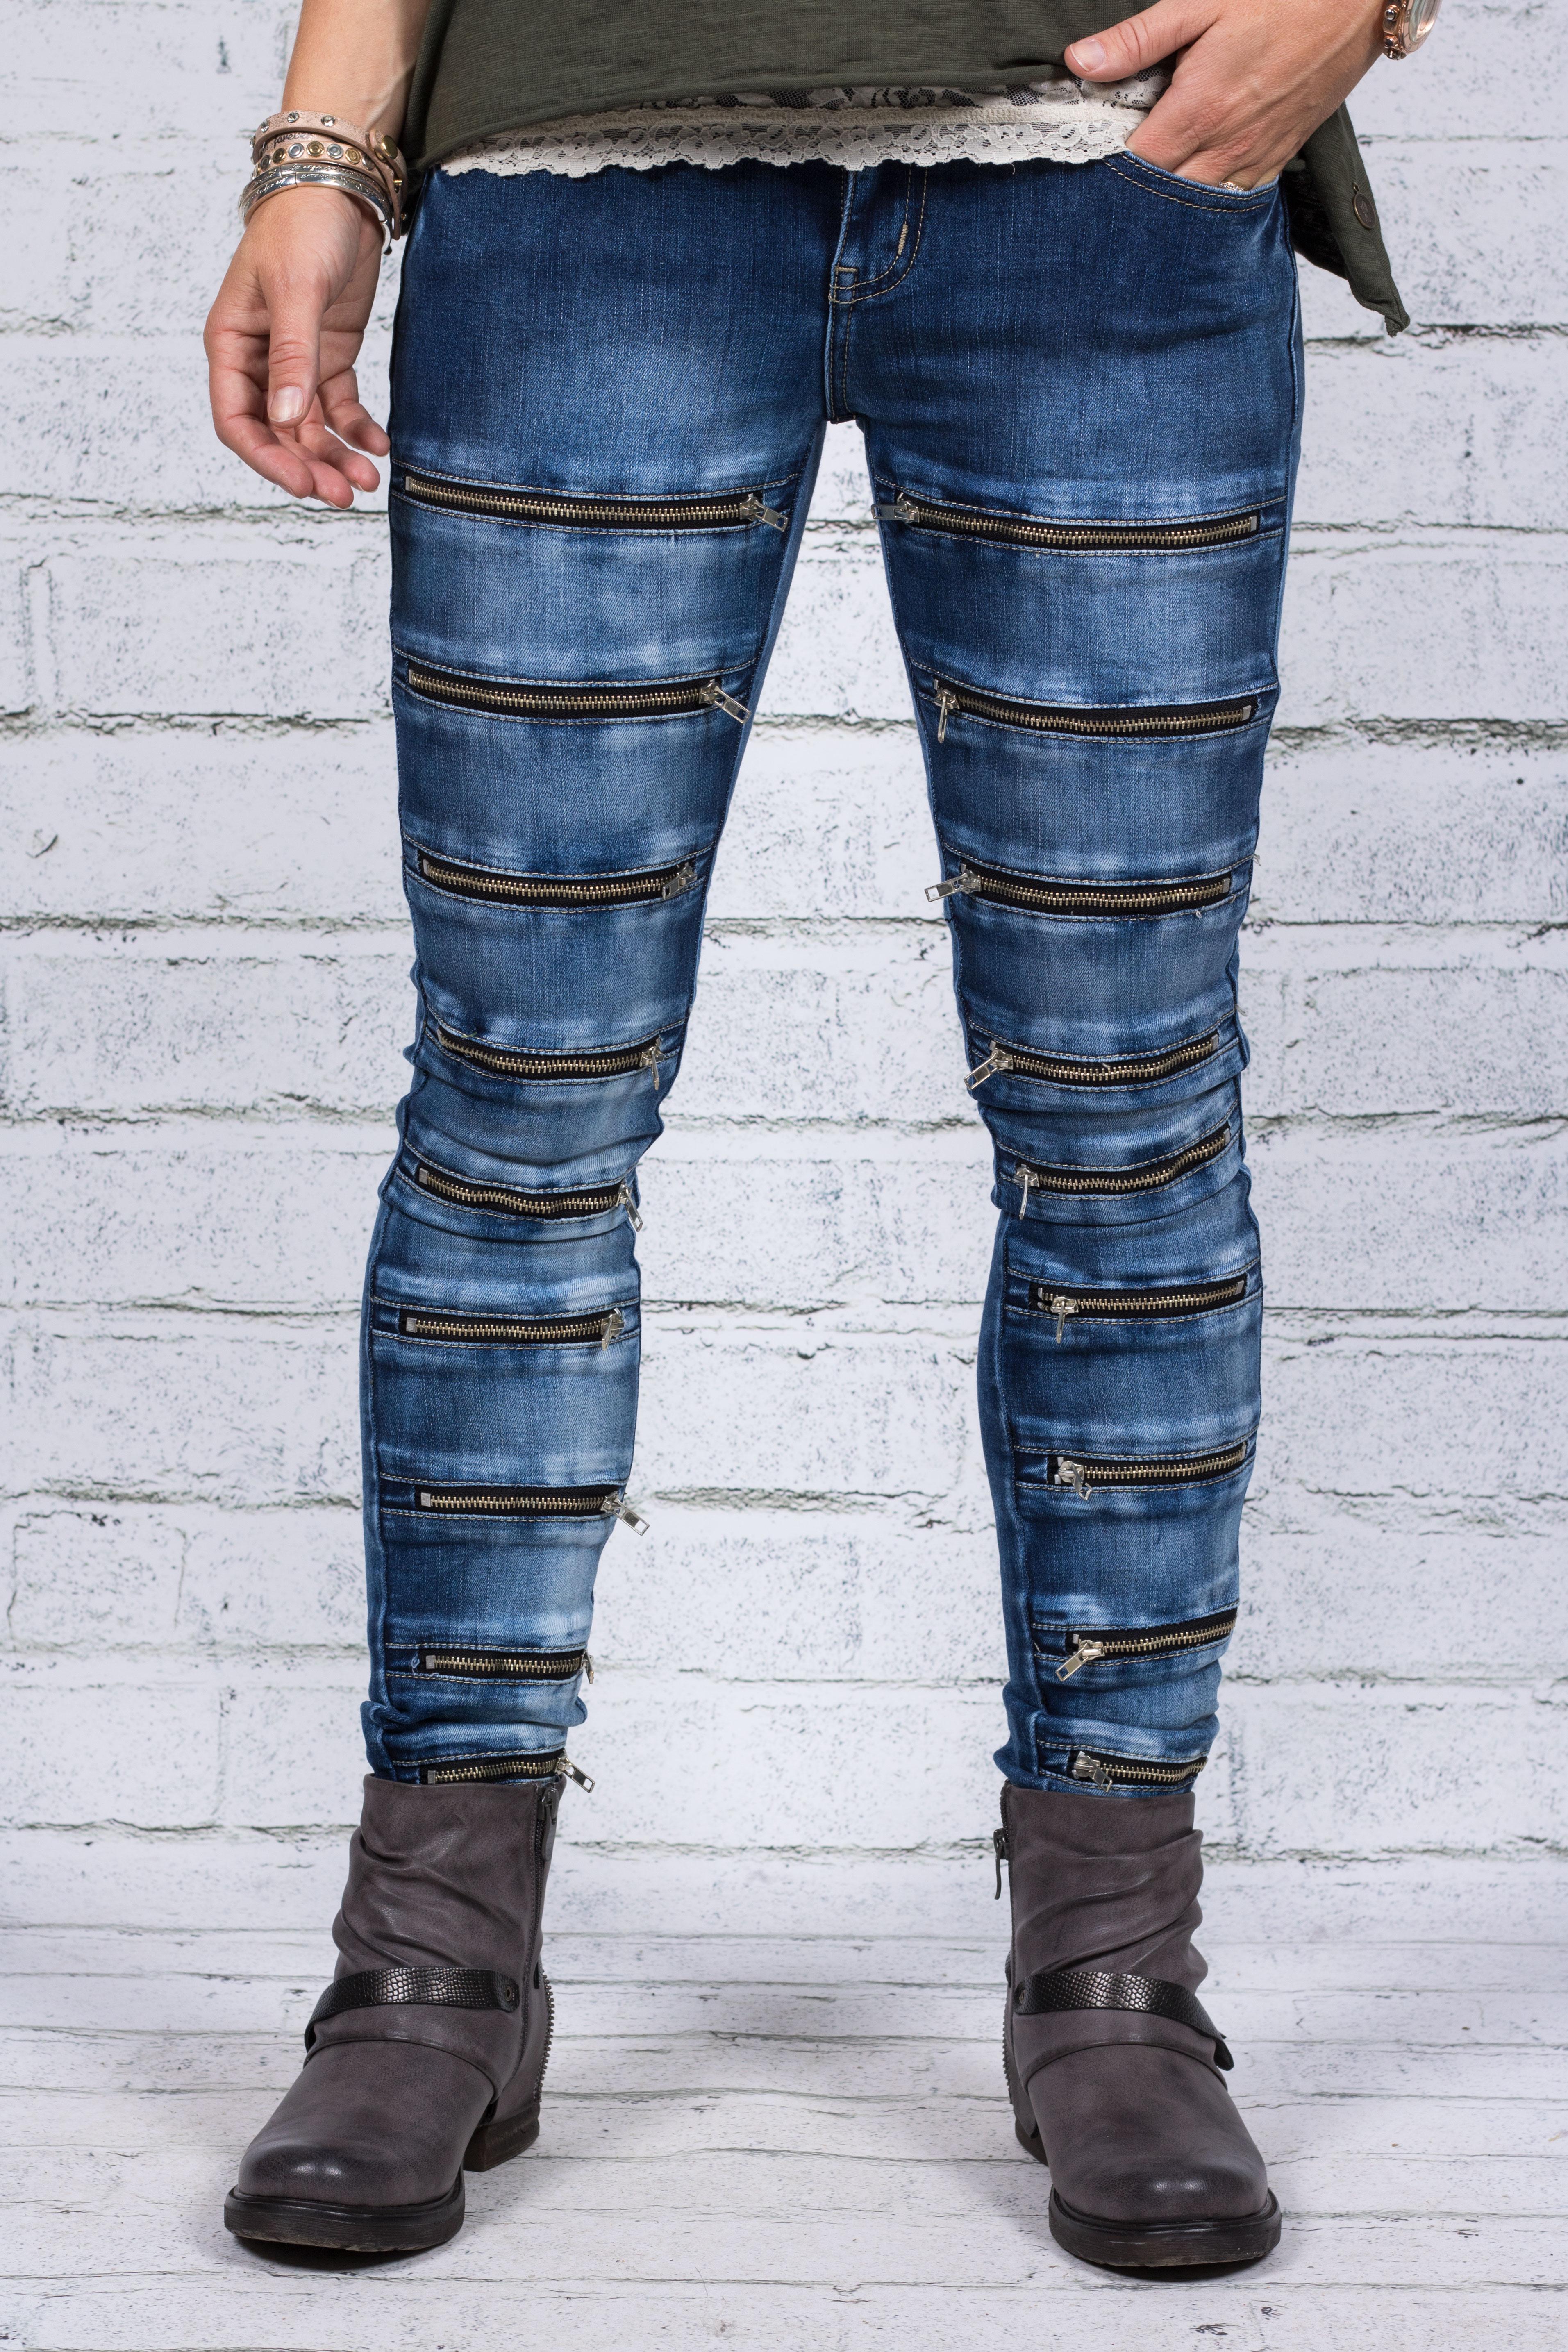 Jeans Q1747 - Dragkedjor på benen - Mörktvätt 0310d5cb6b9e7